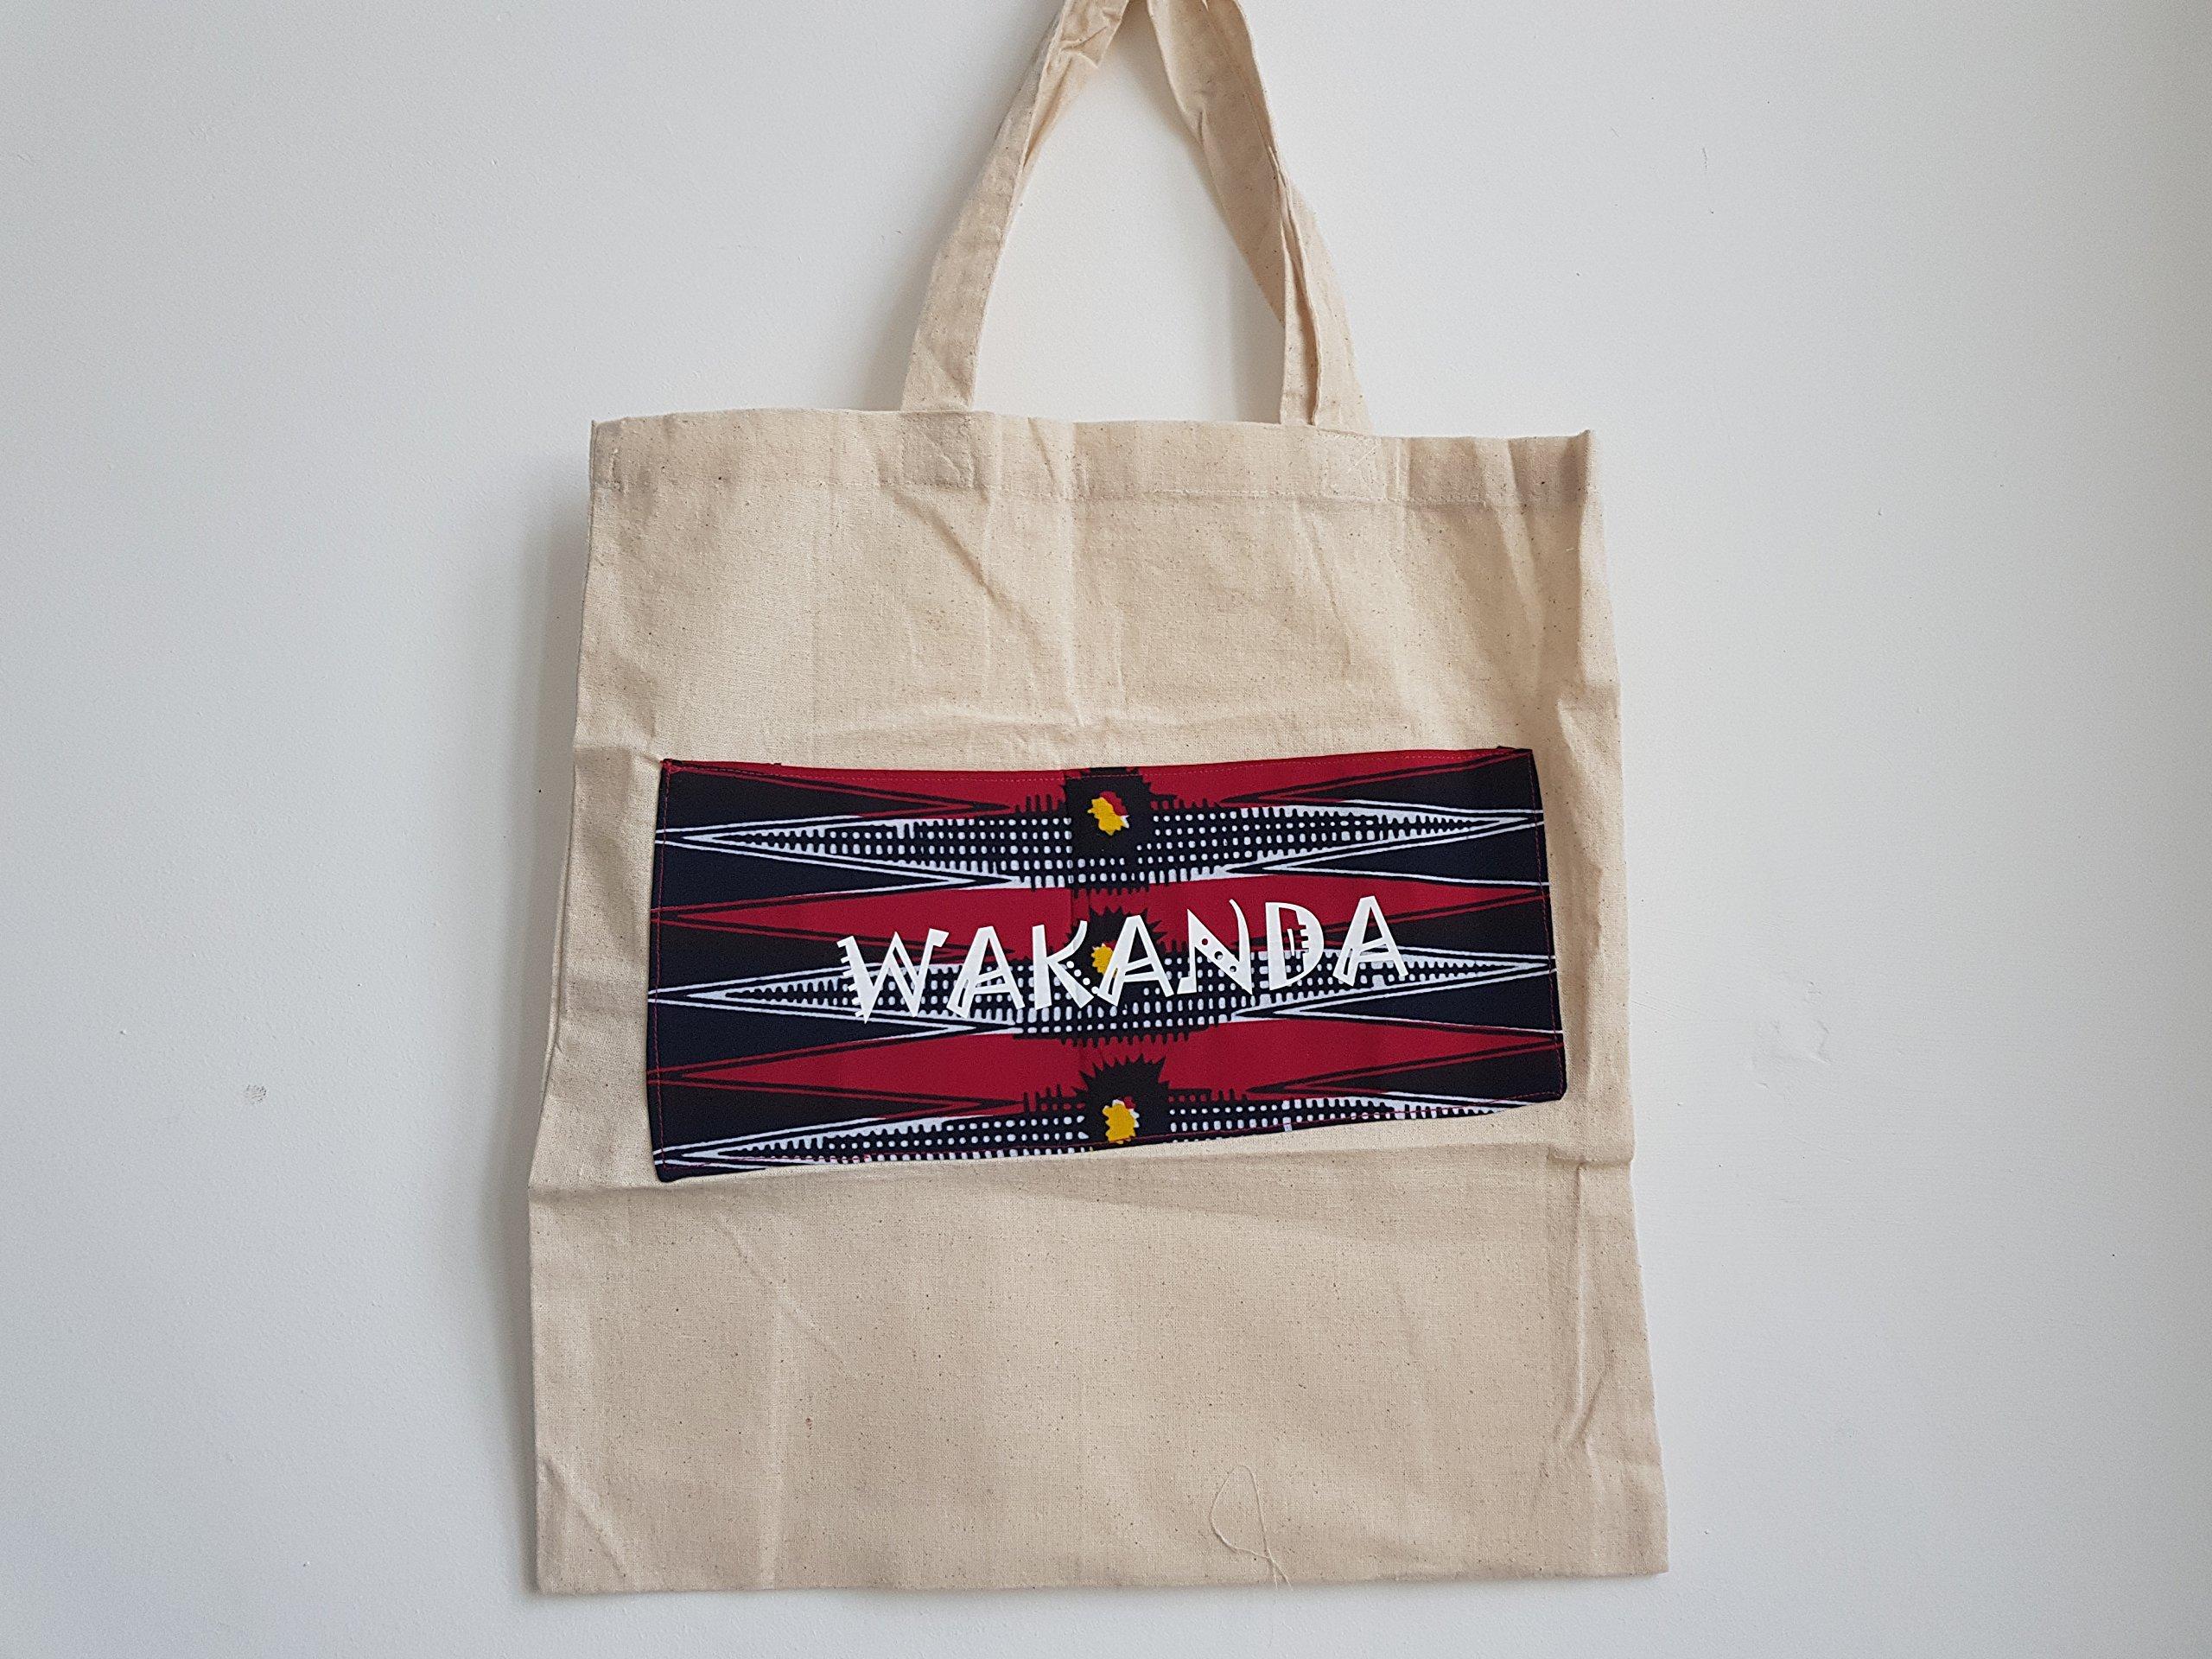 Customised Calico Tote Shopper Bag with Ankara African Wax print - Wakanda Black Panther - handmade-bags